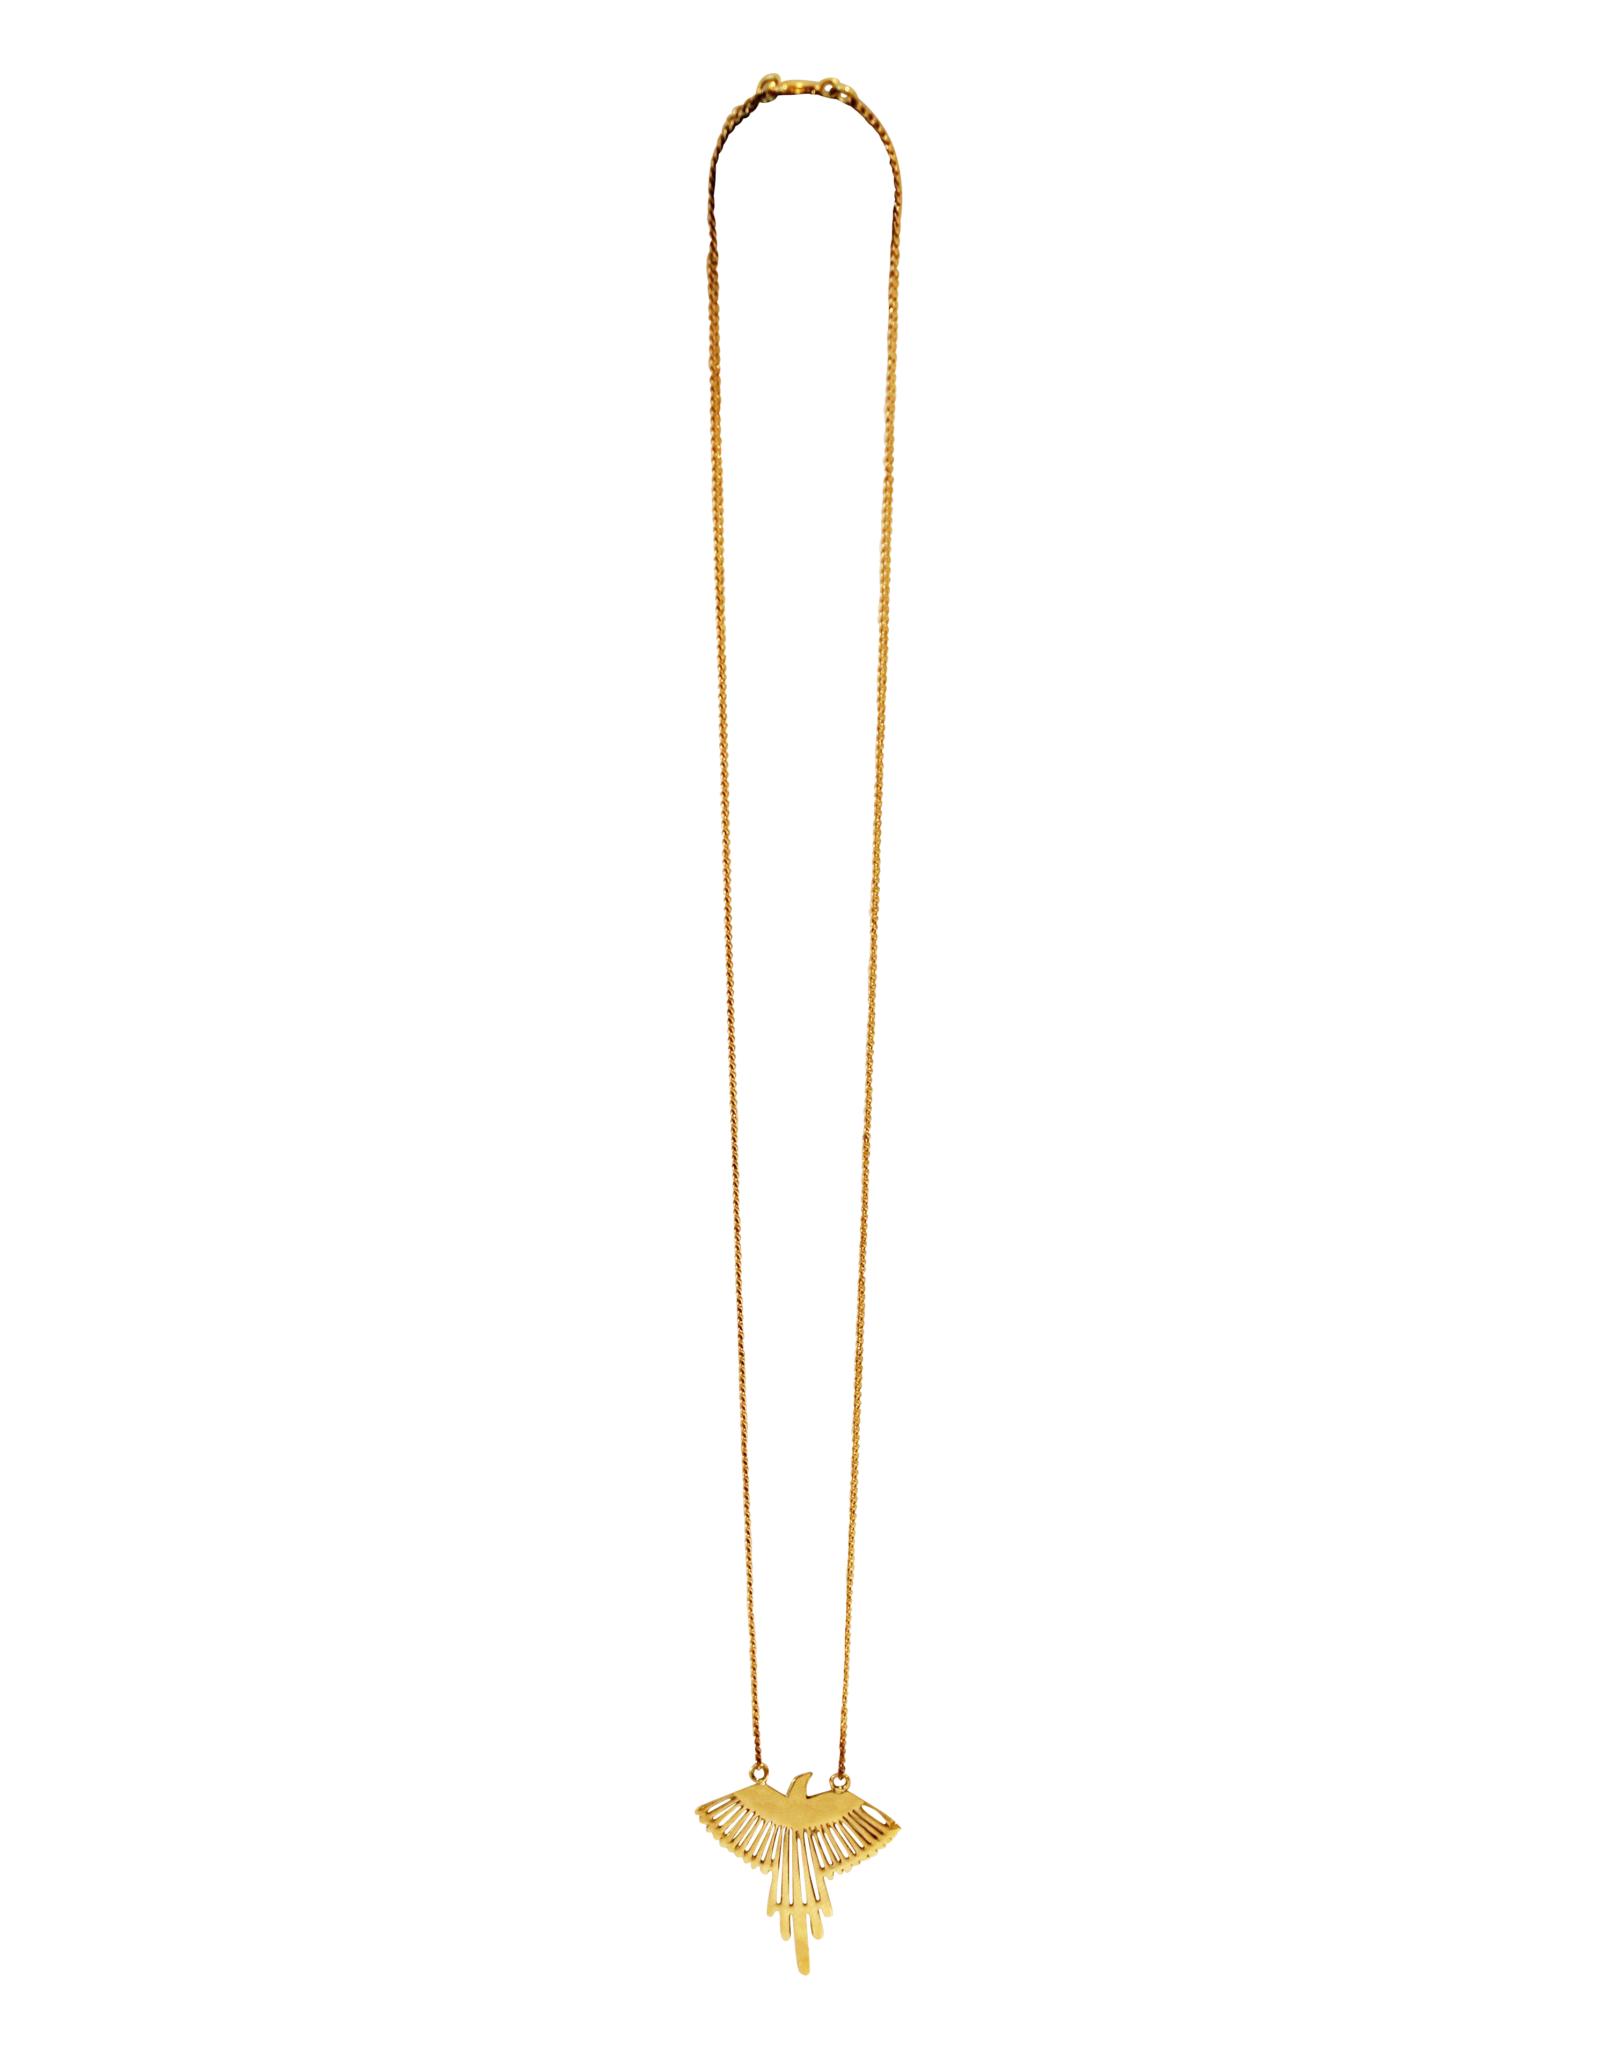 Vayu Jewels Thunderbird Necklace